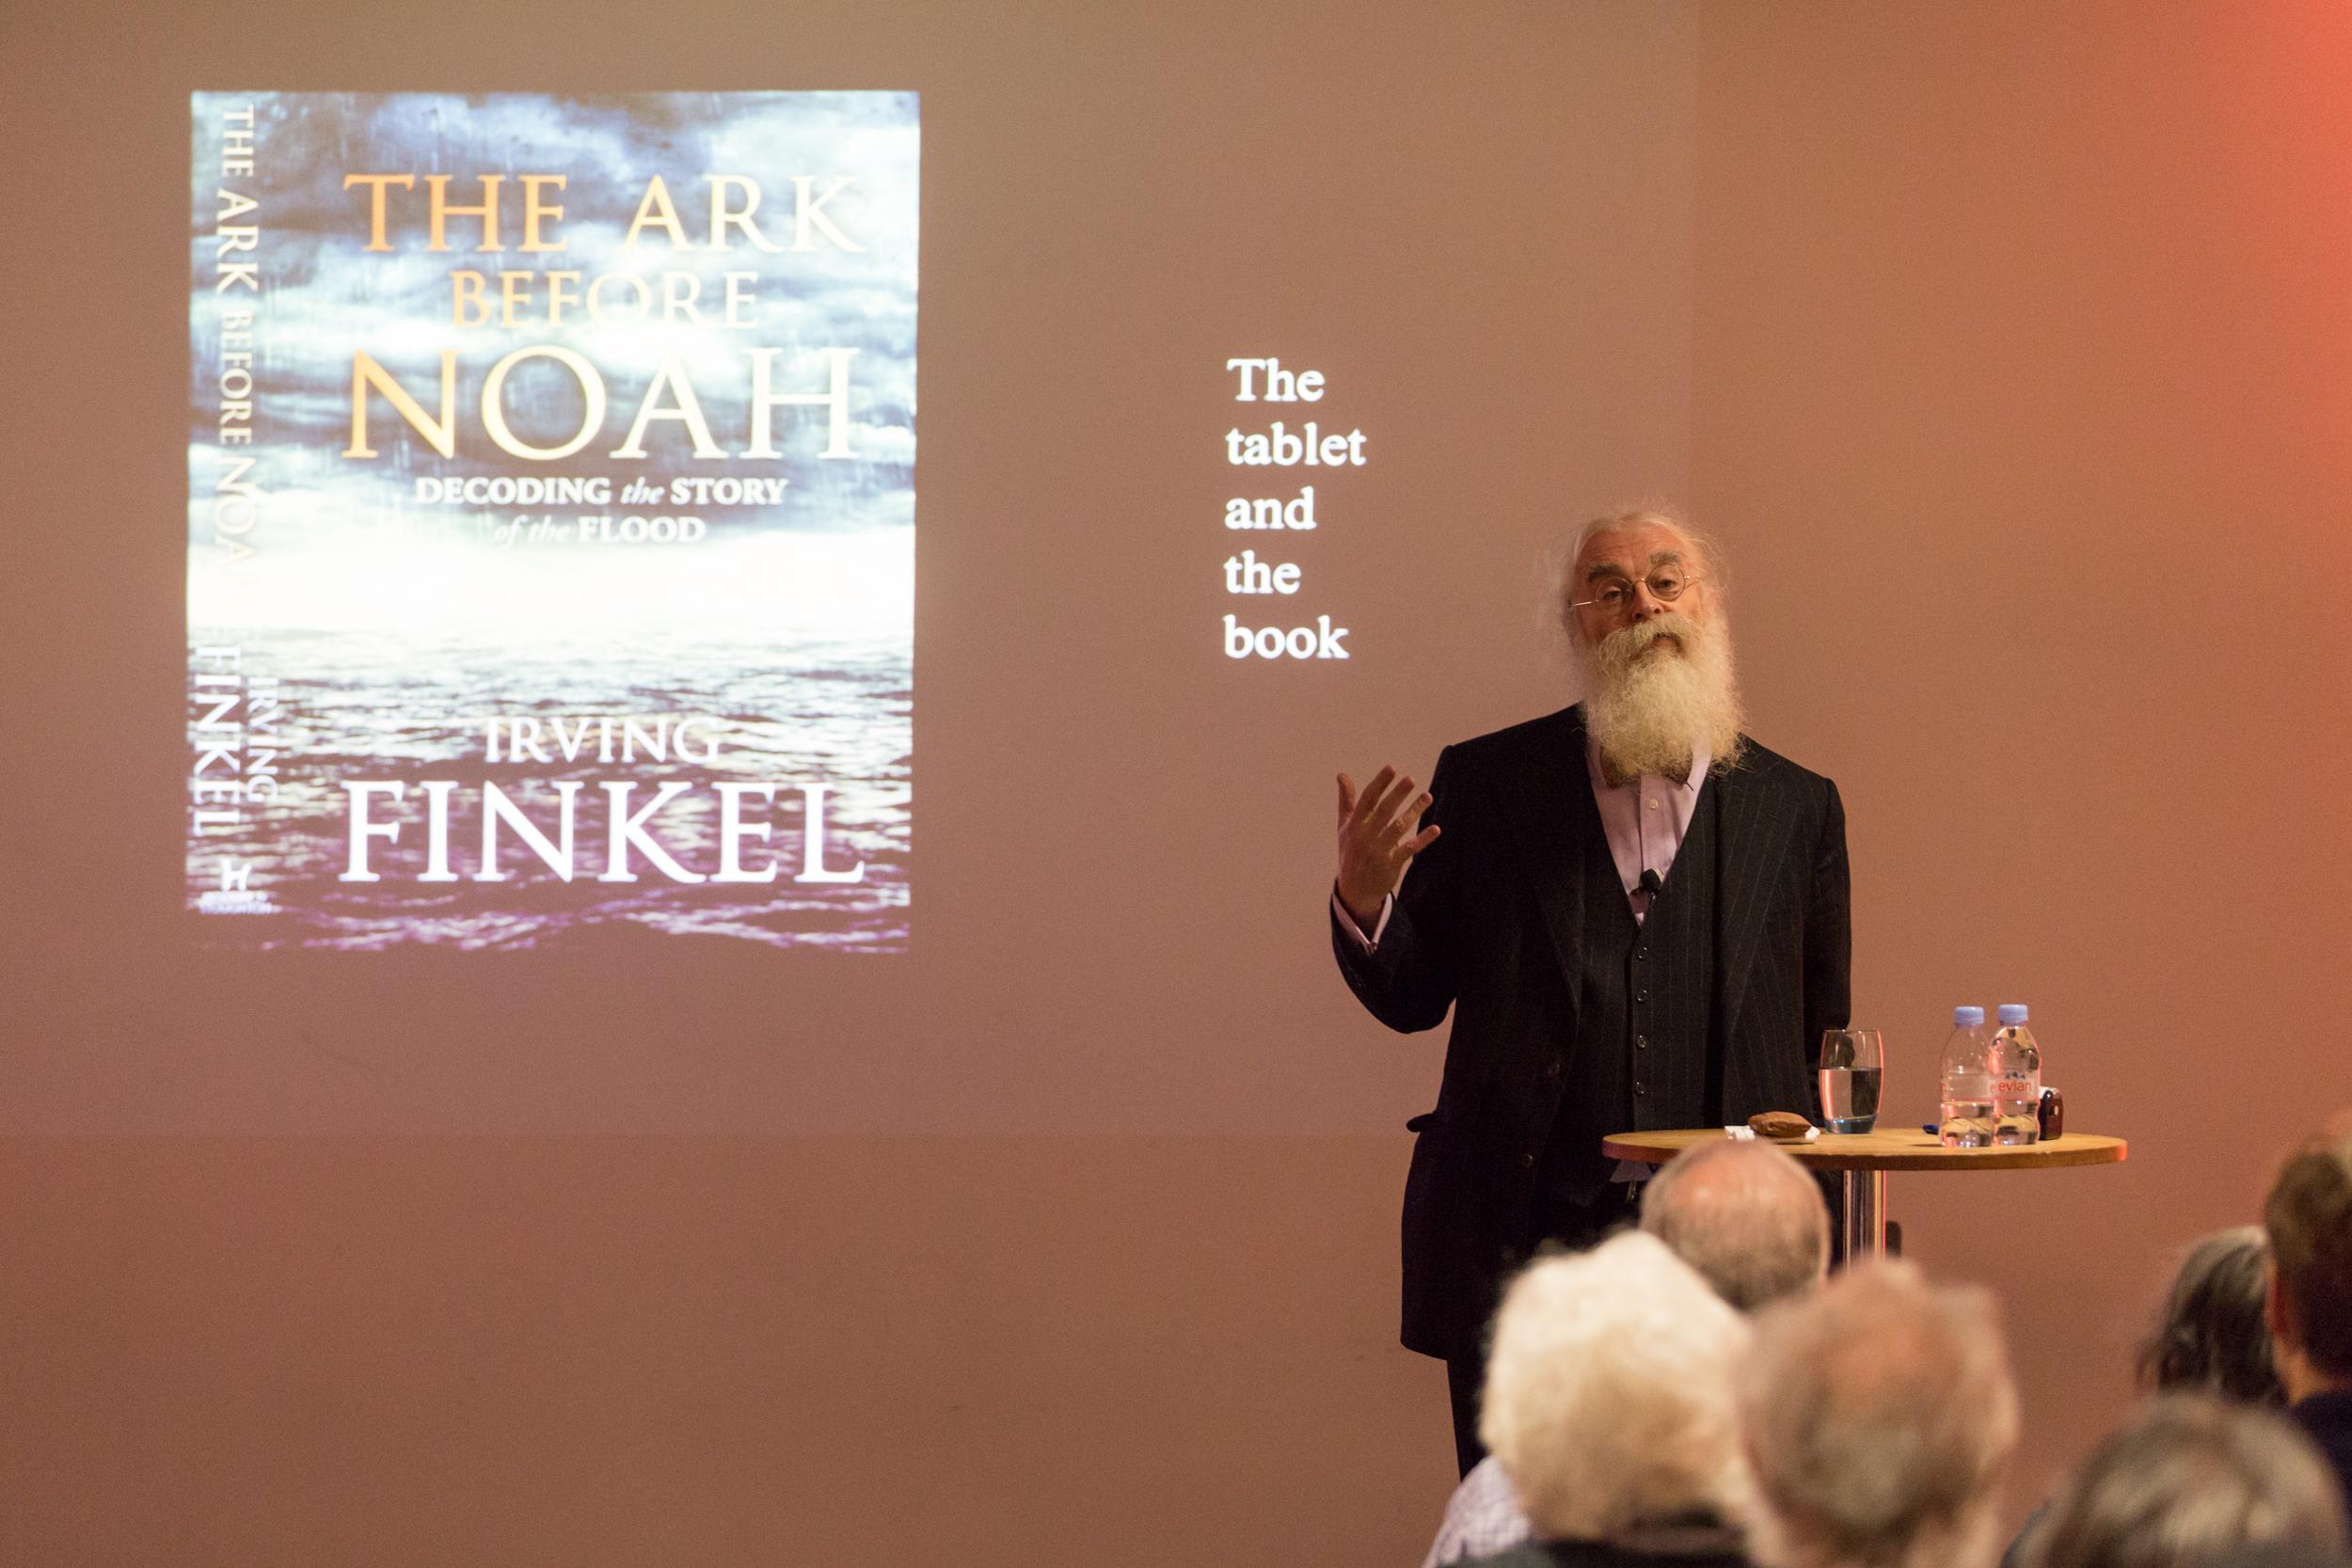 JBW - Thurs 27.2.14 - 3pm - Irving Finkel The Ark before Noah - Andy Tyler Photography-3624.jpg